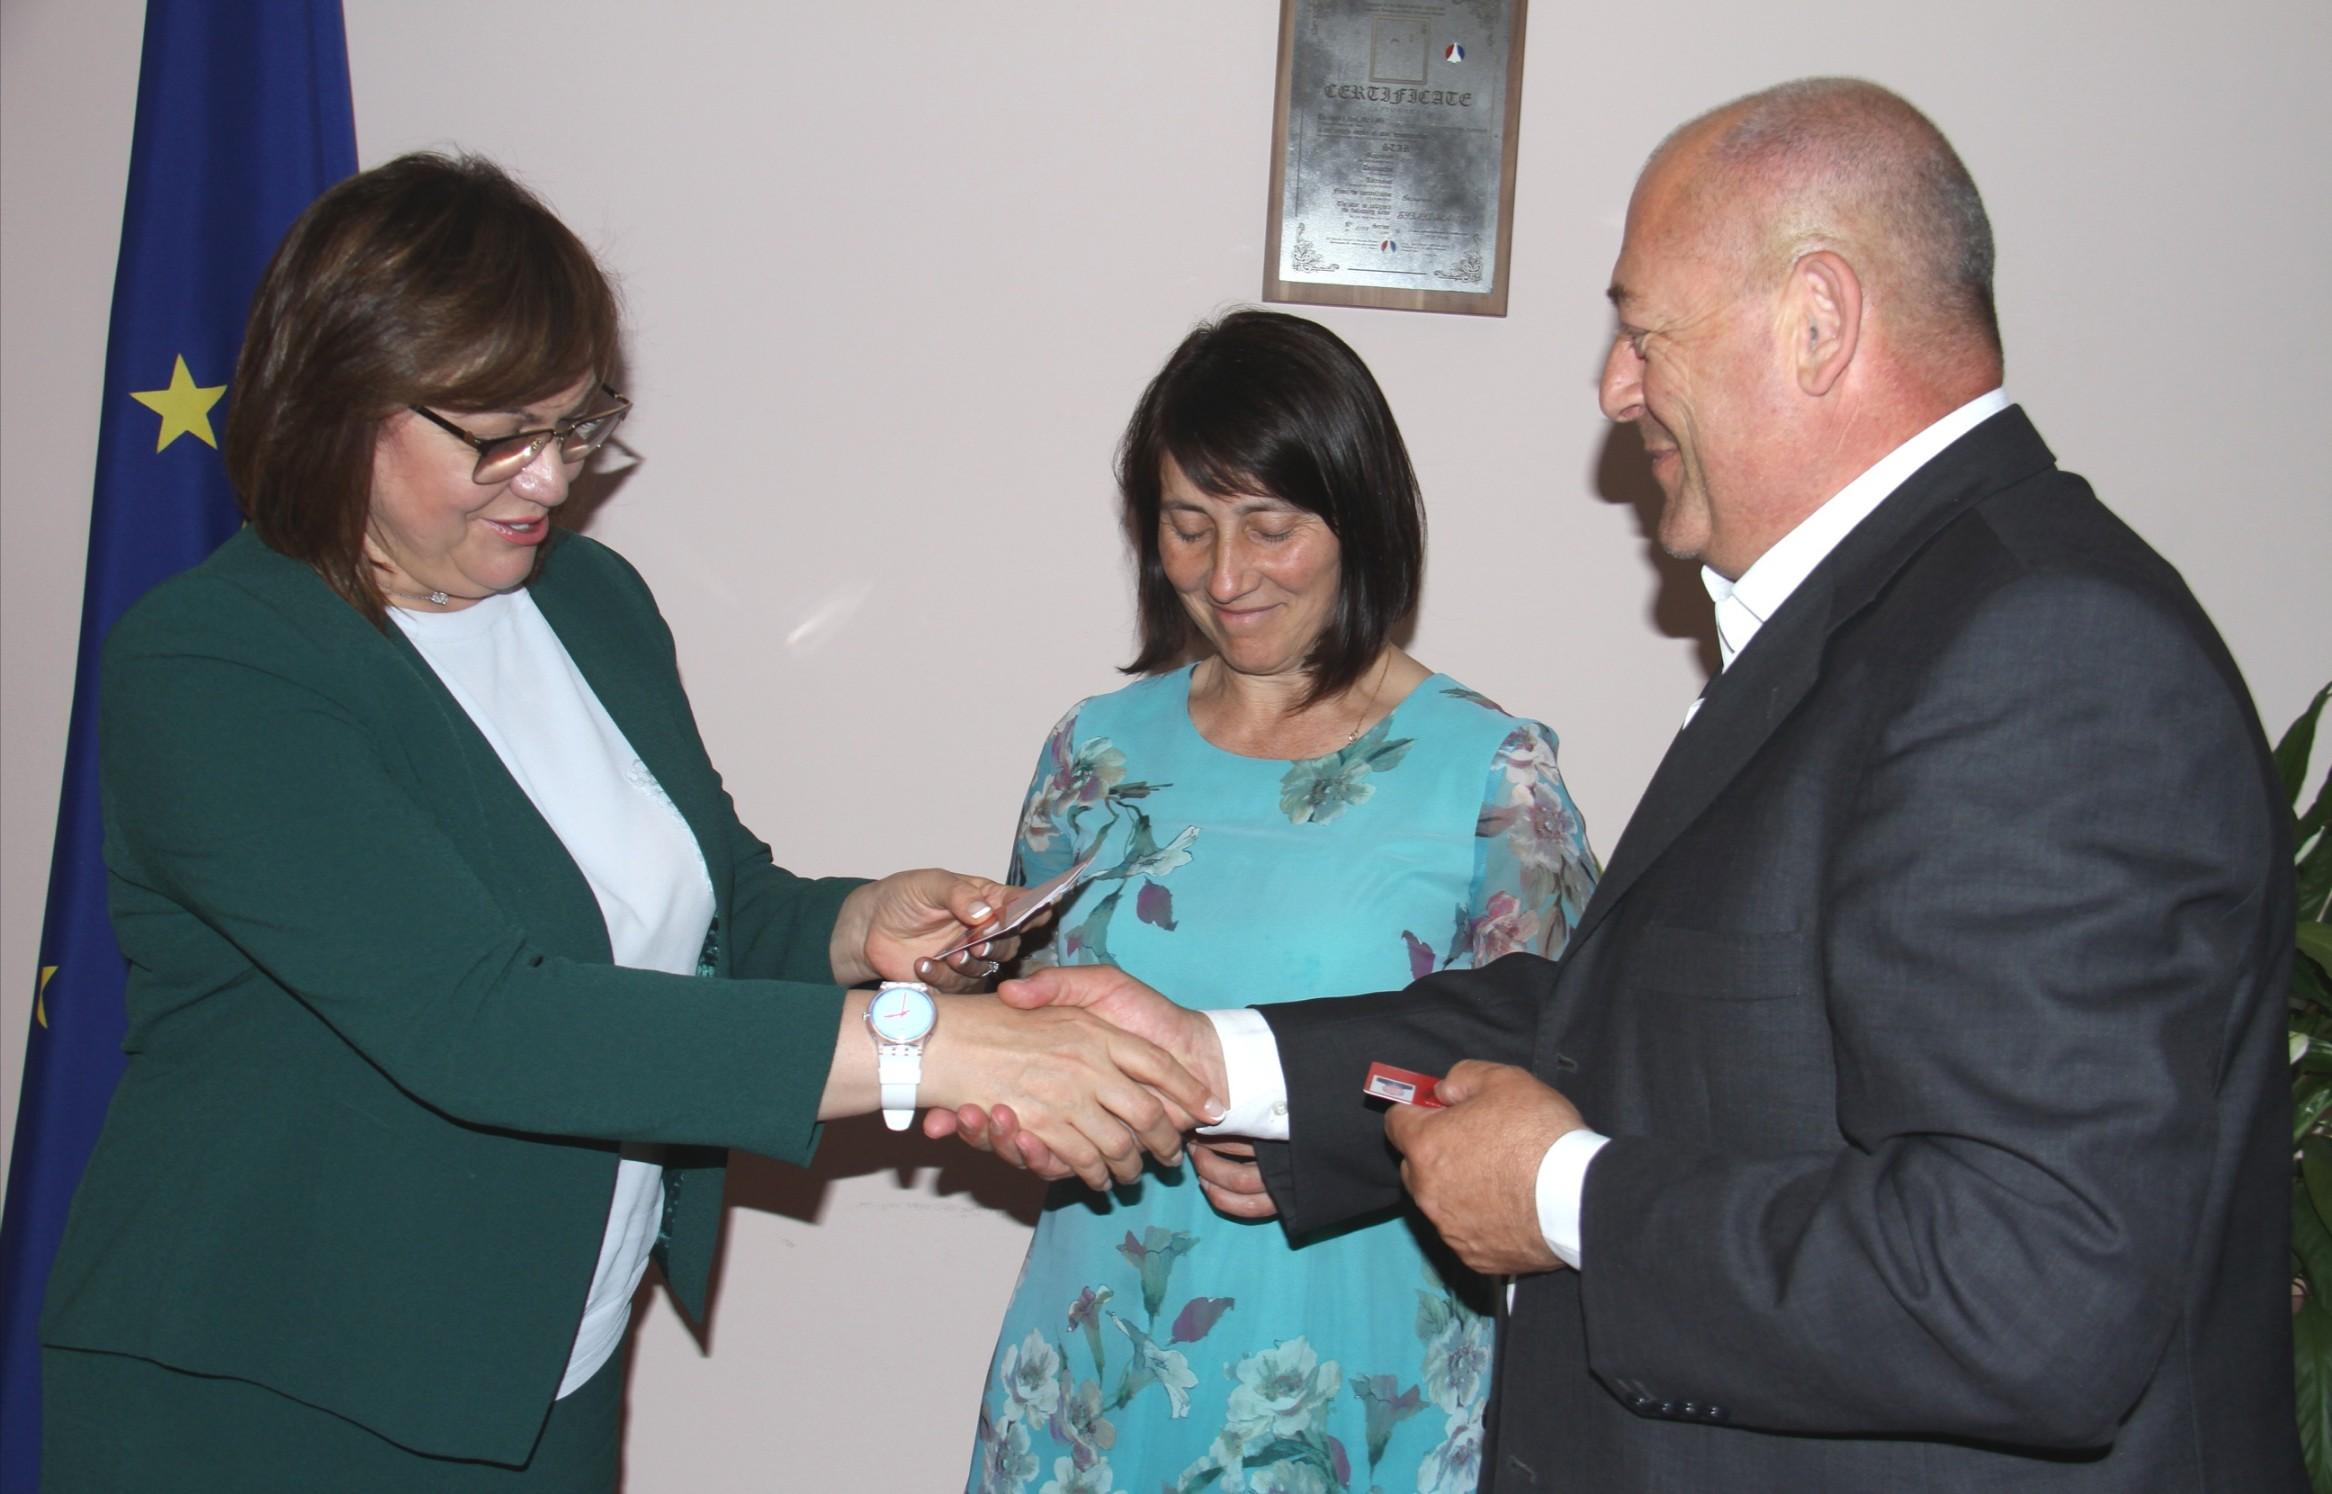 От страна на БСП бяха ангажирани зам-председателят Кристиан Вигенин, който